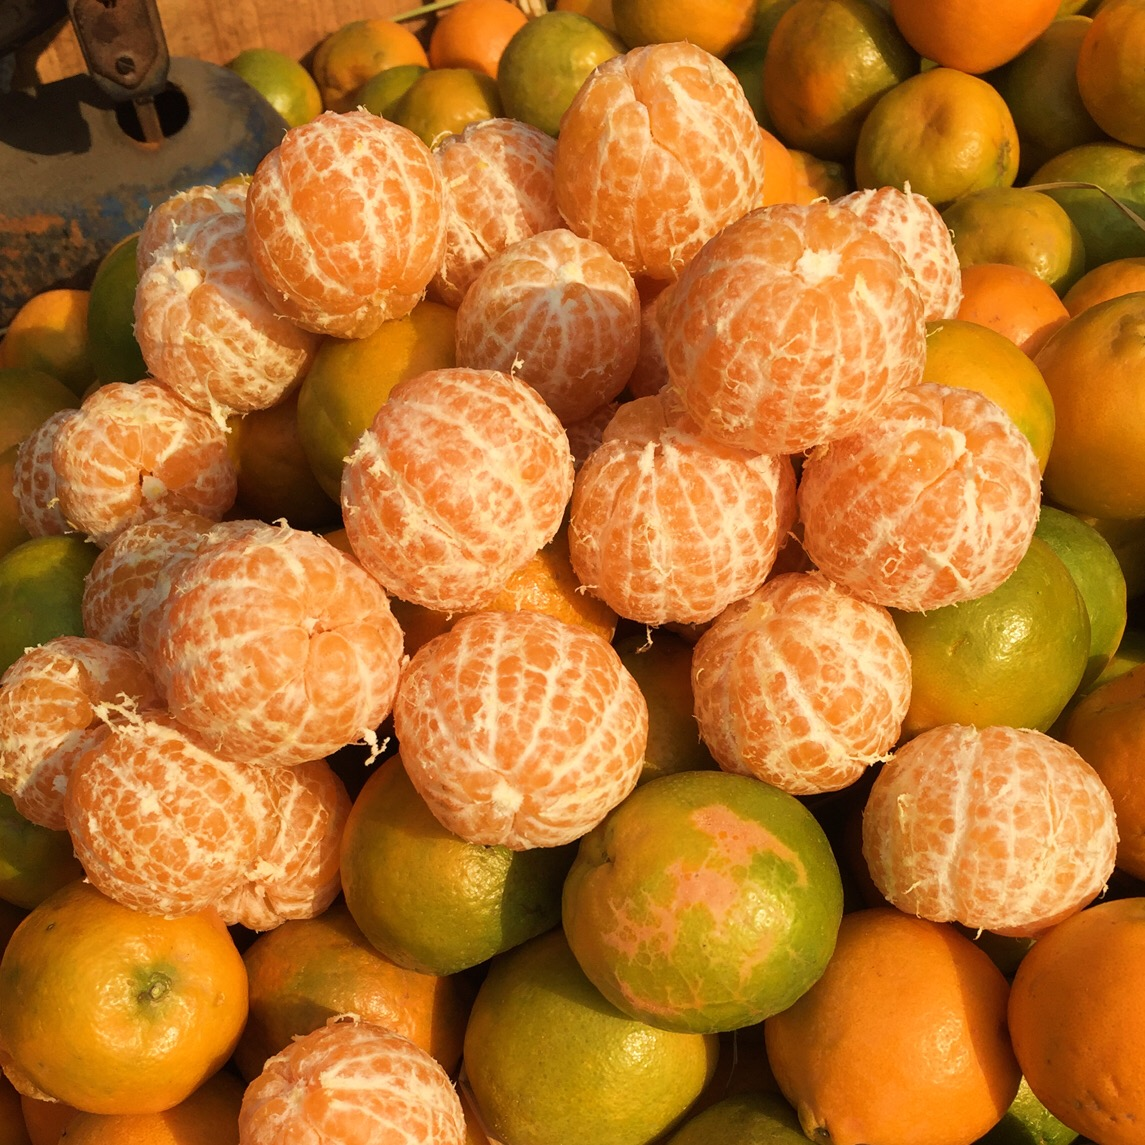 Oranges for sale in Oranges for sale in Old Delhi's Chandni Chowk market